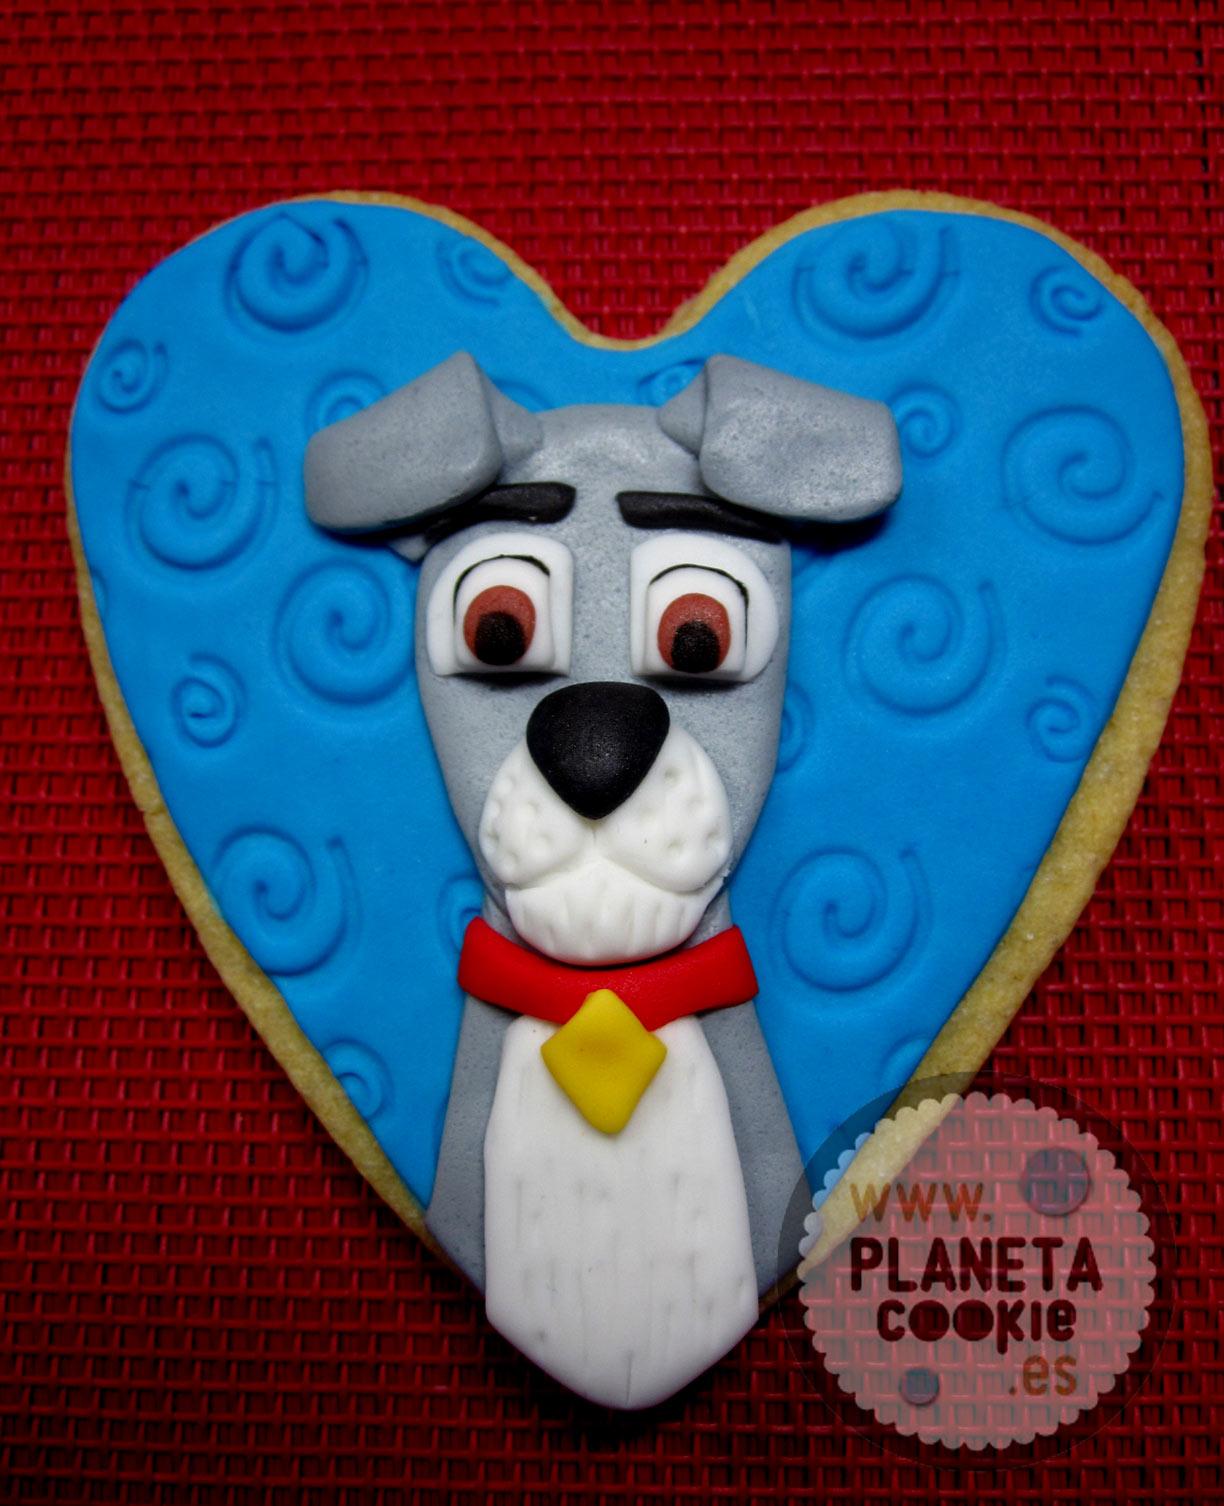 disney   Planeta Cookie   Page 2